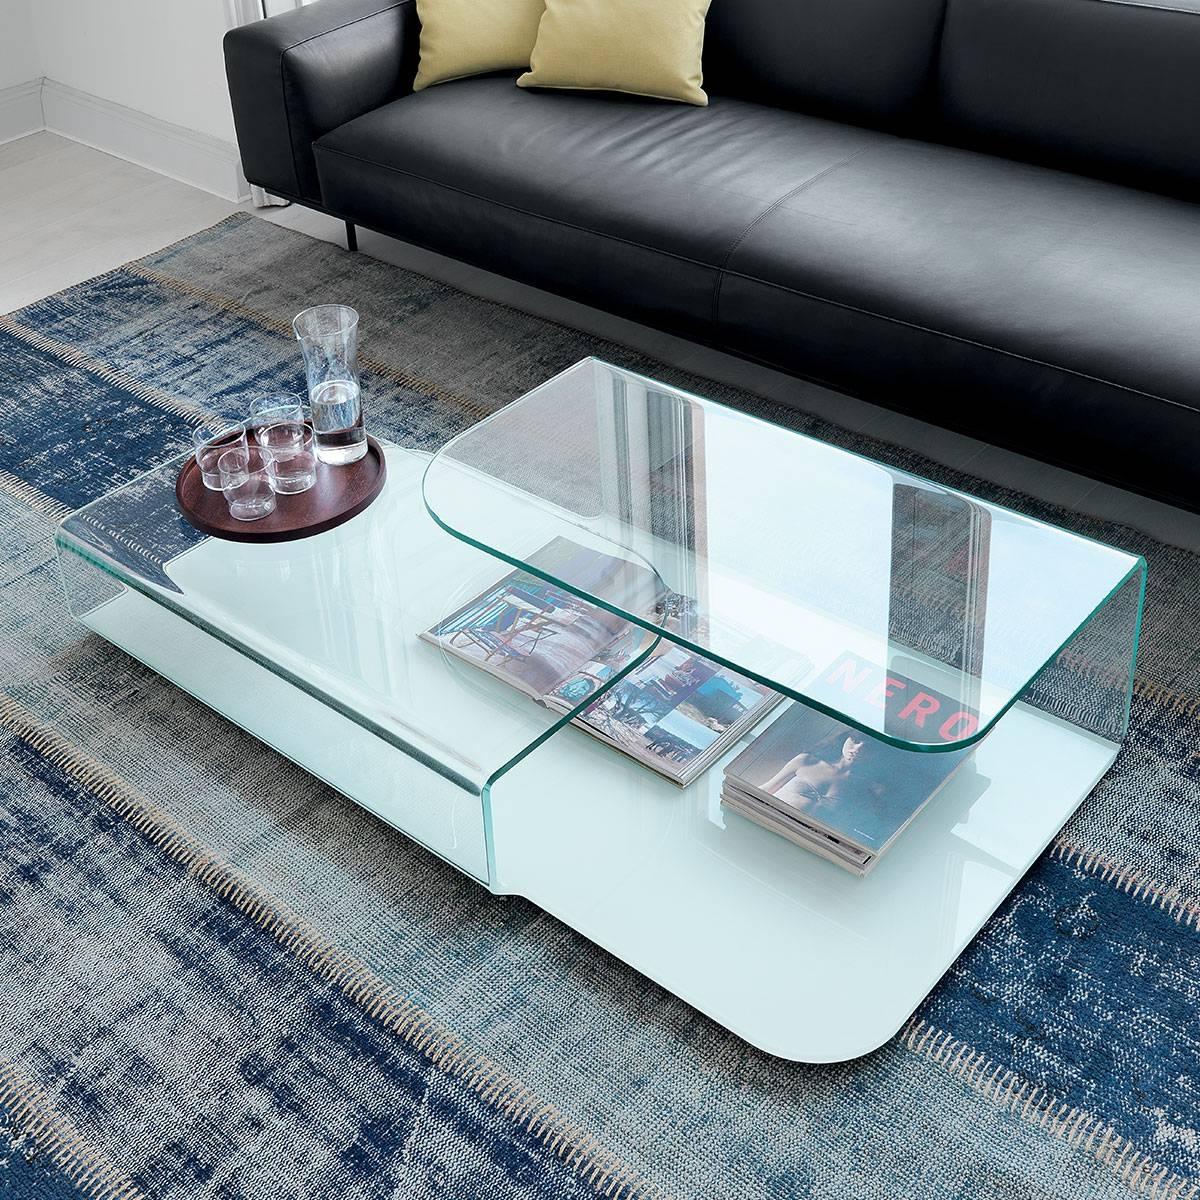 Hug Curved Glass Coffee Table - Klarity - Glass Furniture for Curved Glass Coffee Tables (Image 22 of 30)